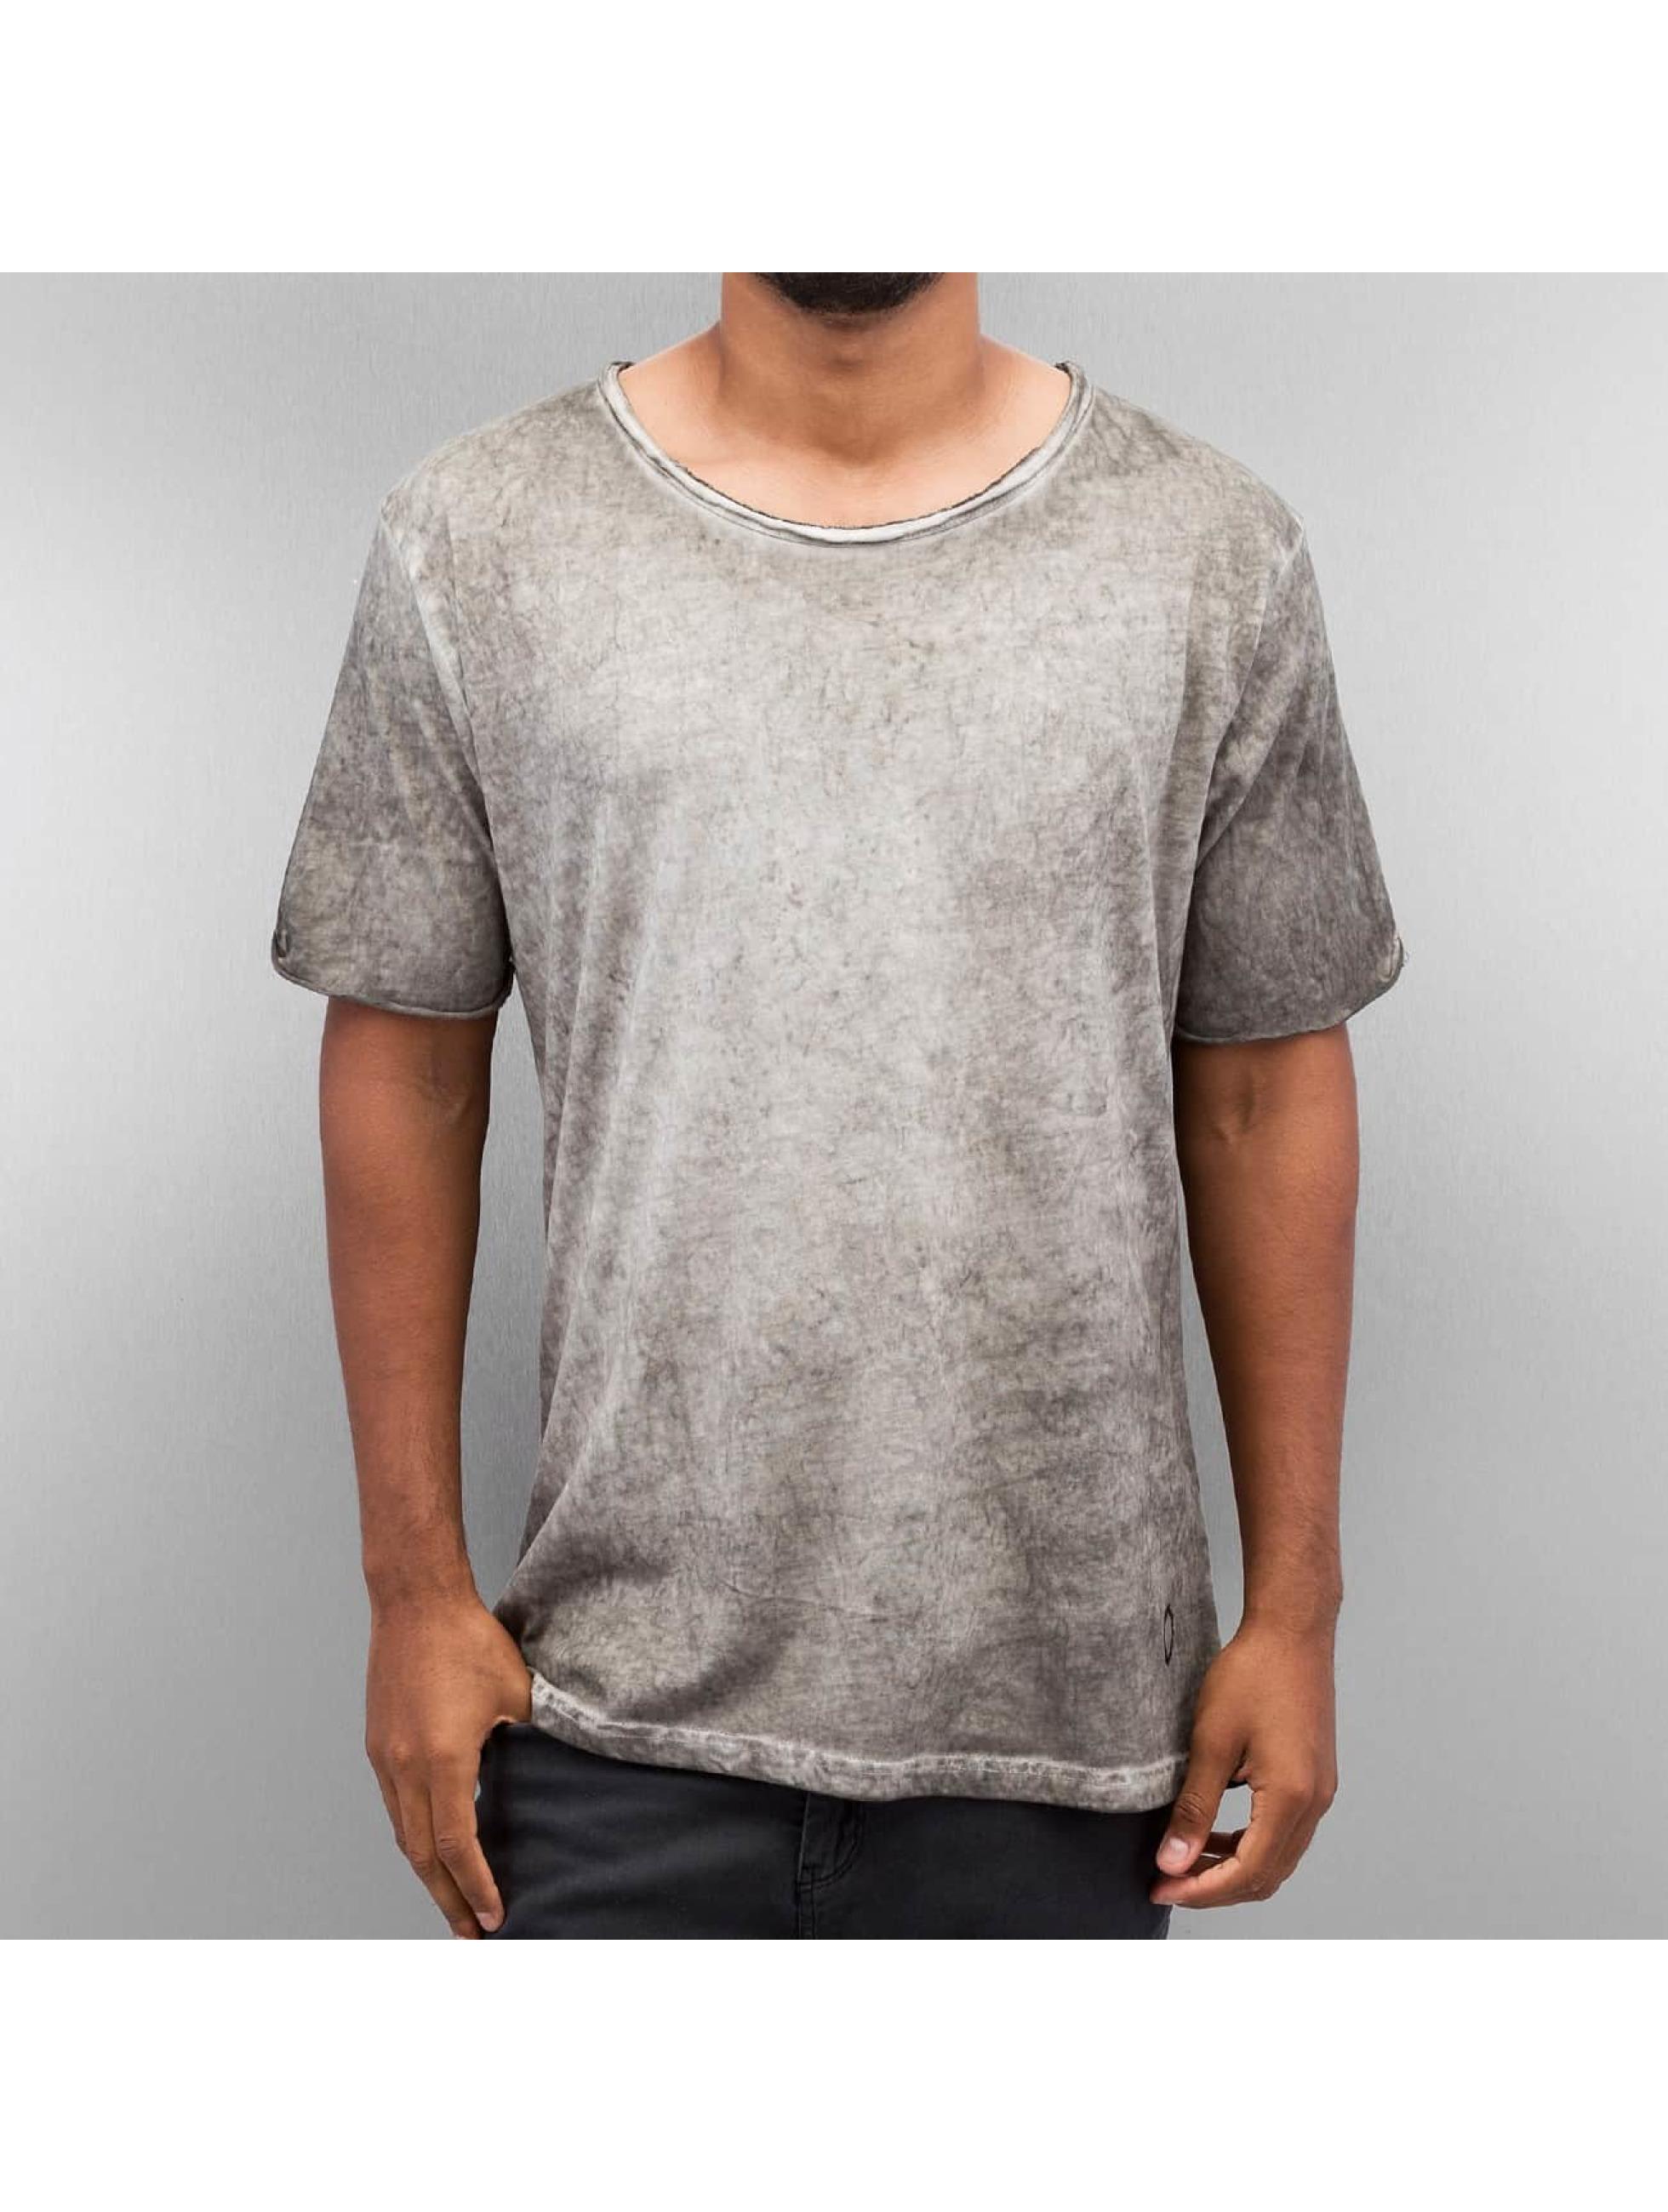 Yezz T-shirt Washed grå